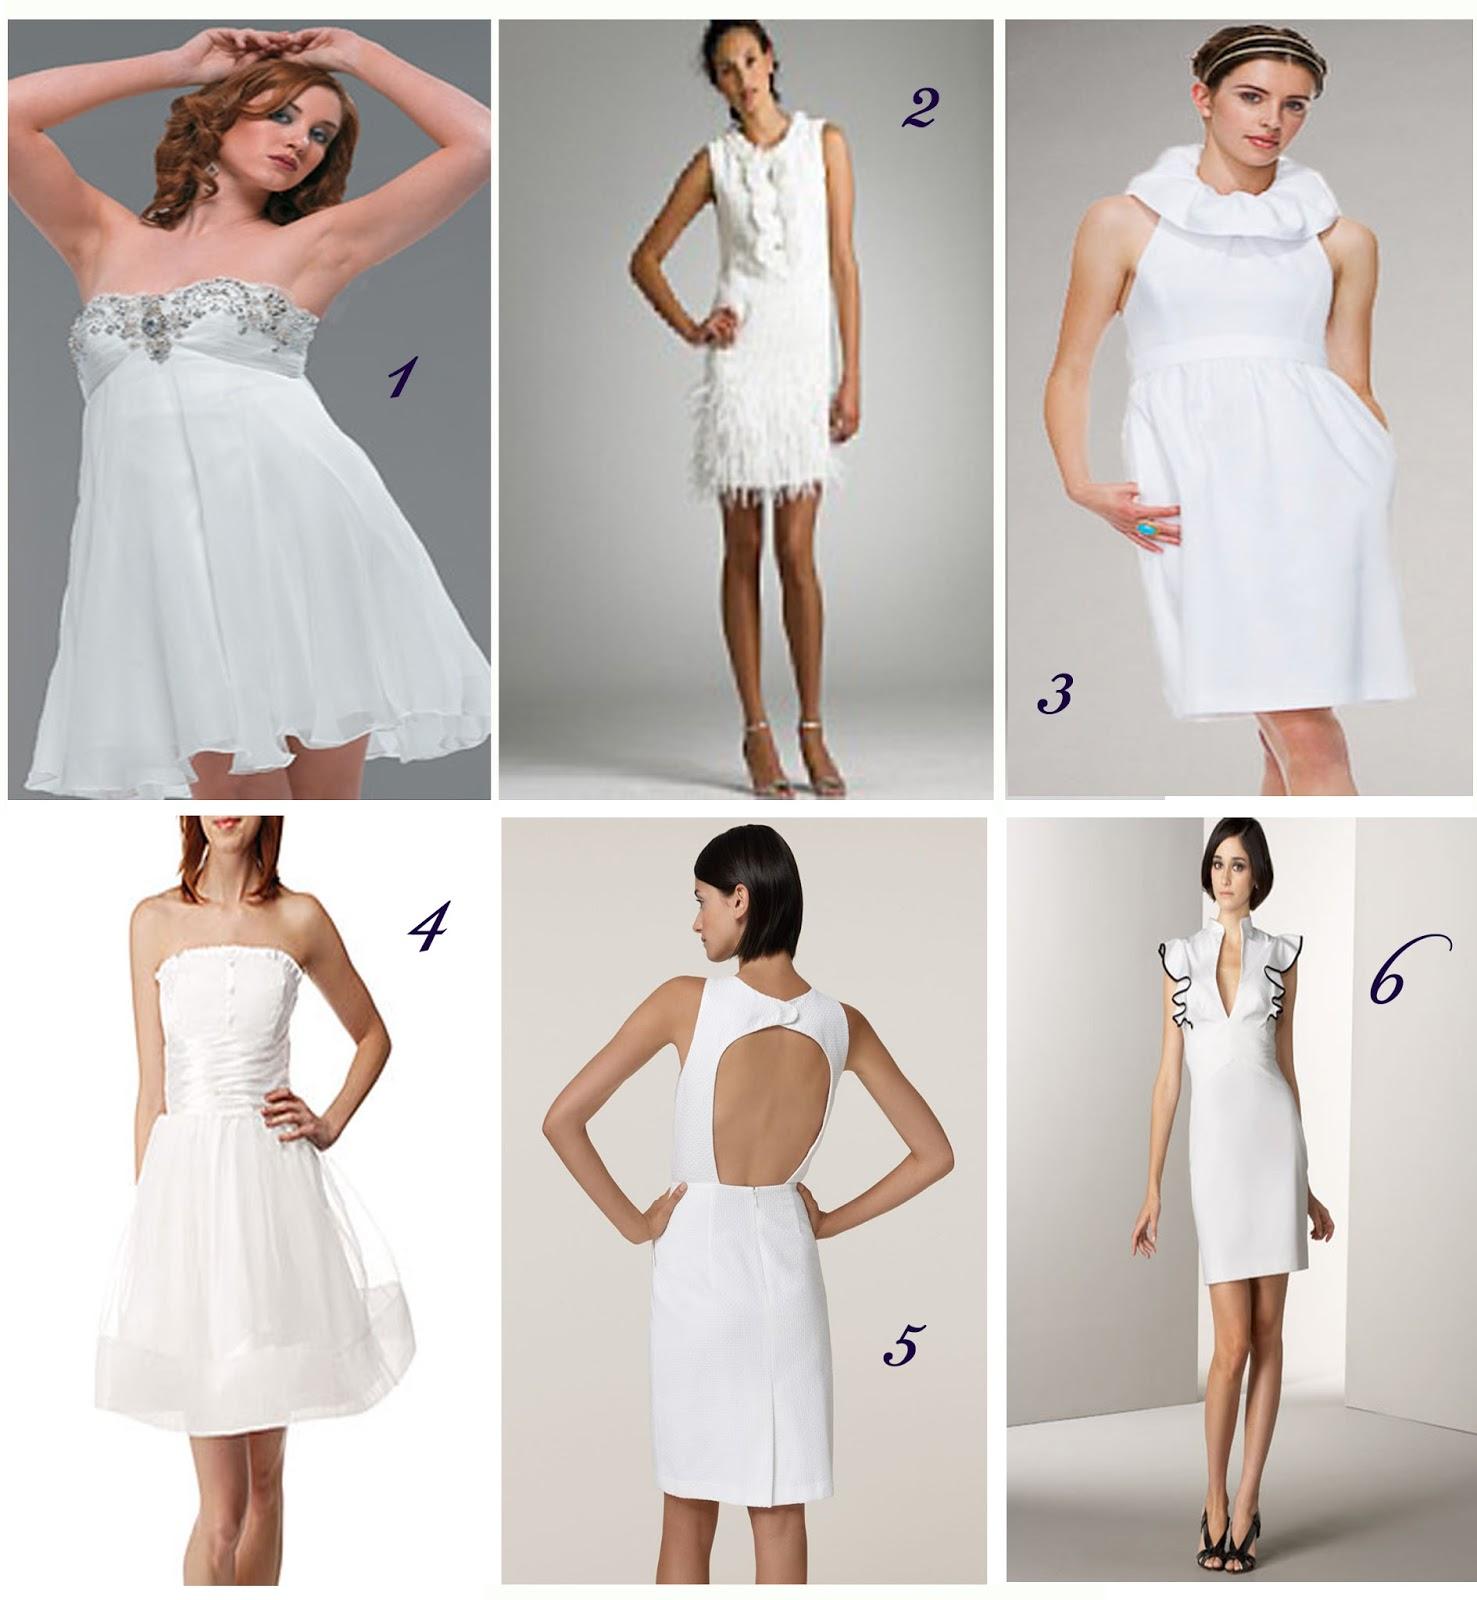 Coolingerie Inspiring Wedding Ideas Of Short Bridal Dresses